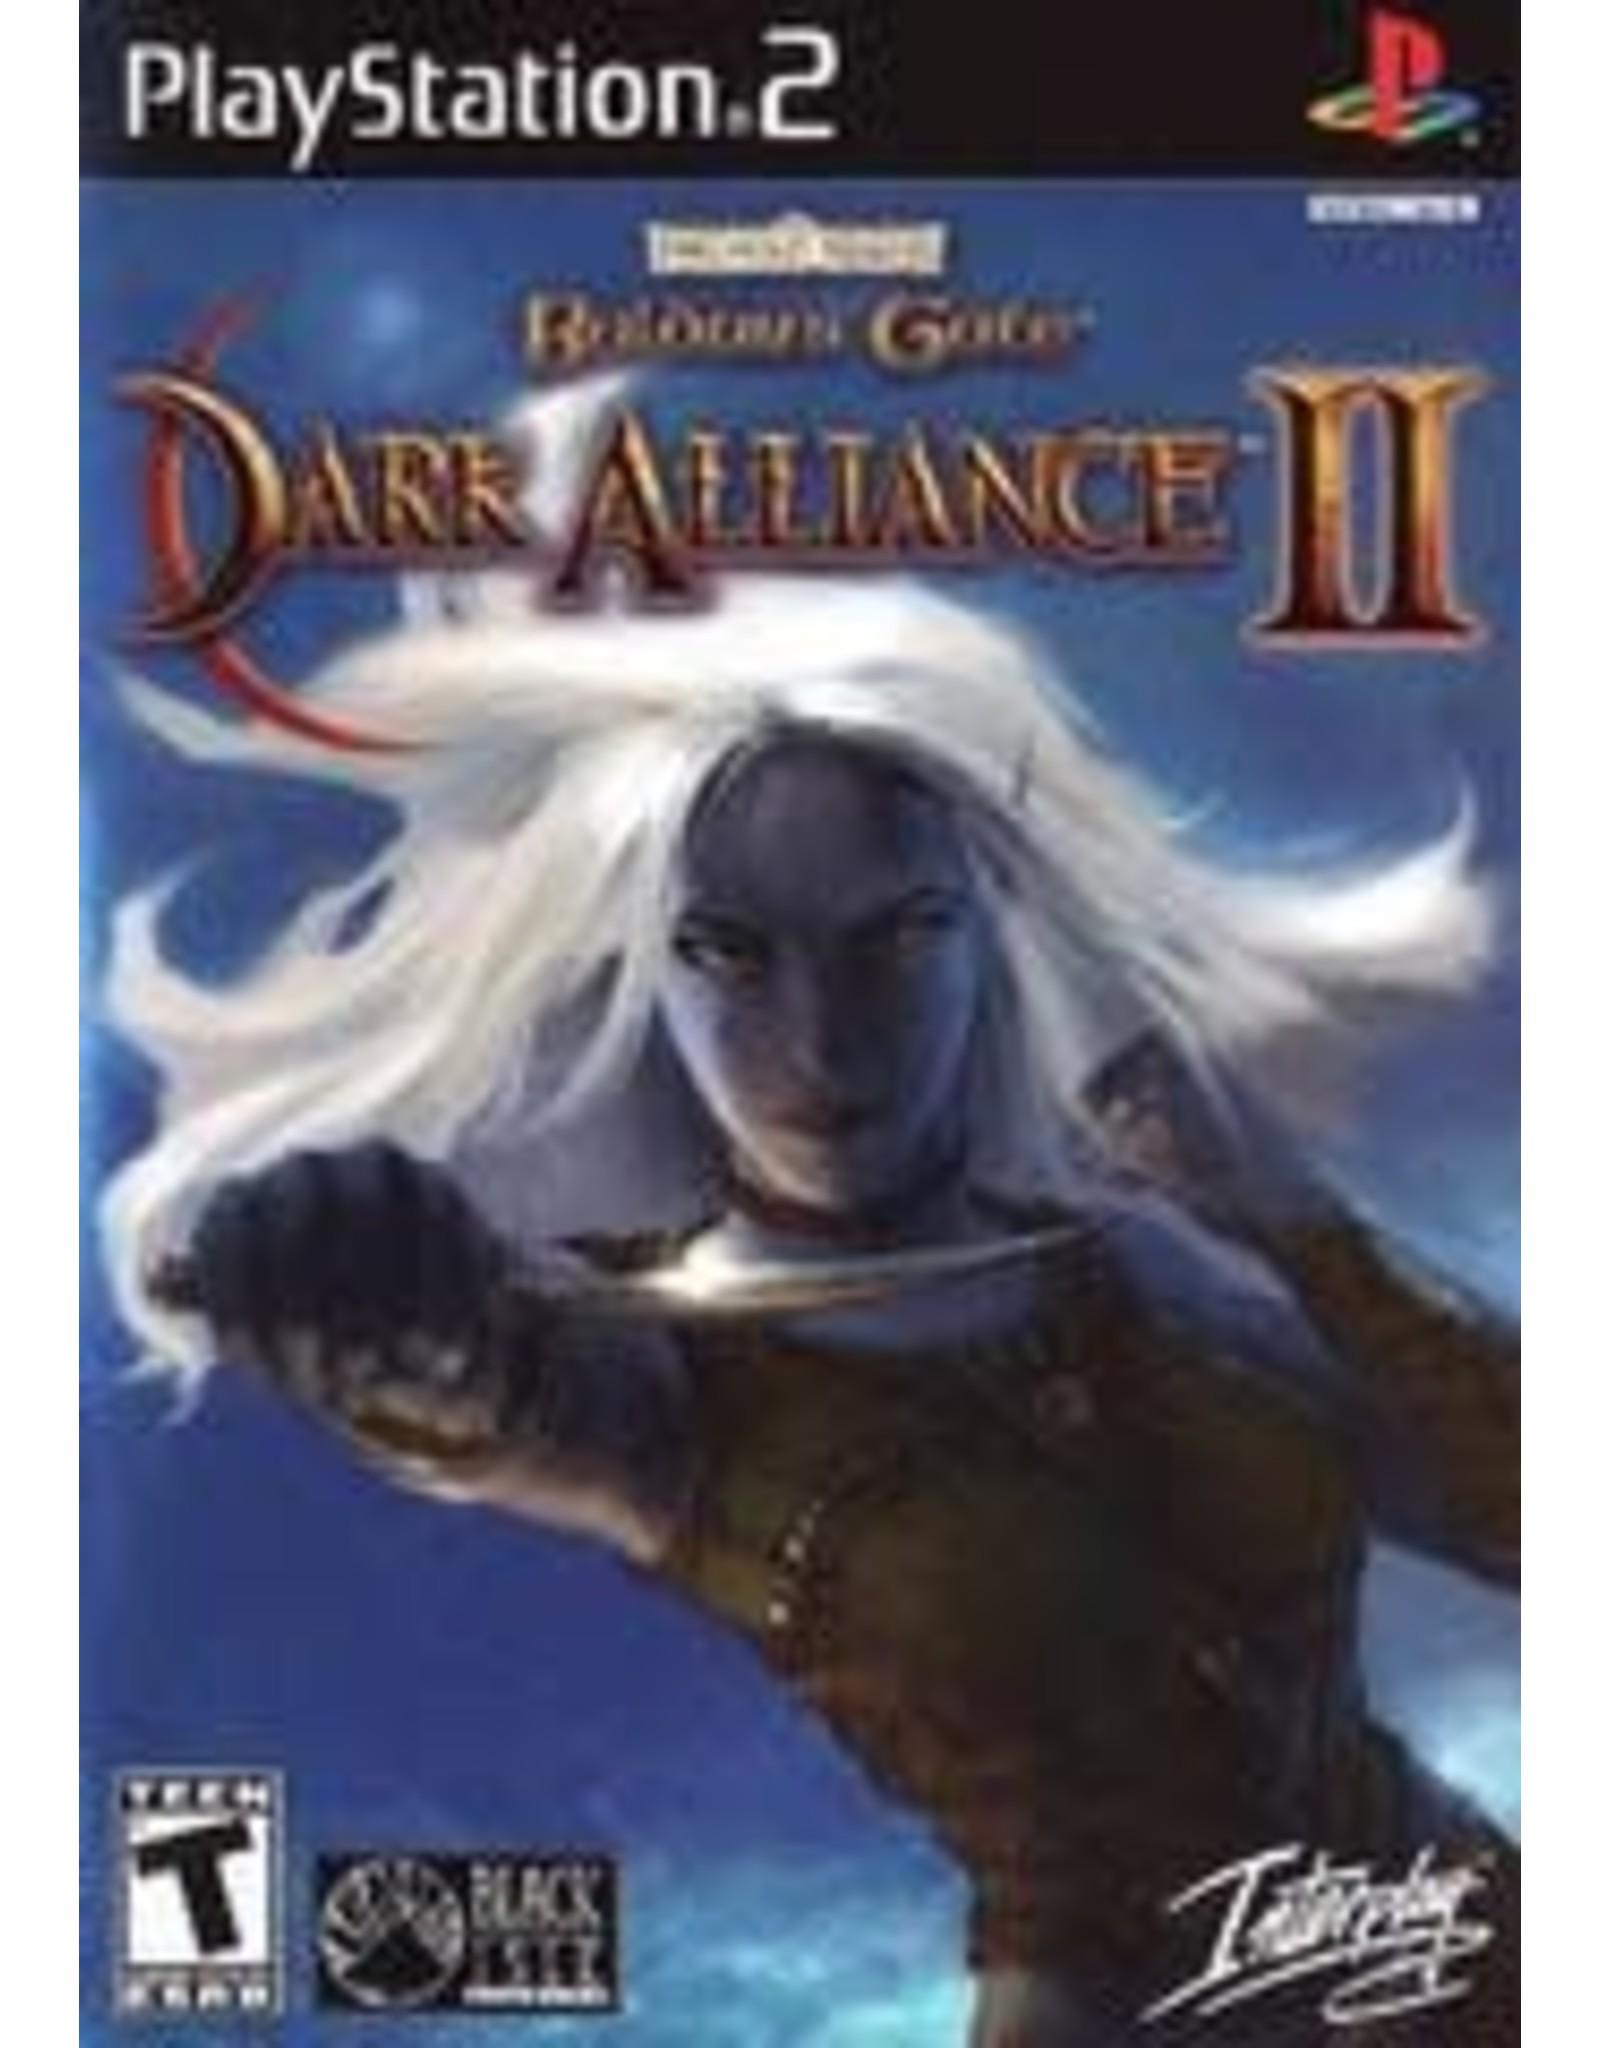 Playstation 2 Baldur's Gate Dark Alliance 2 (CiB)